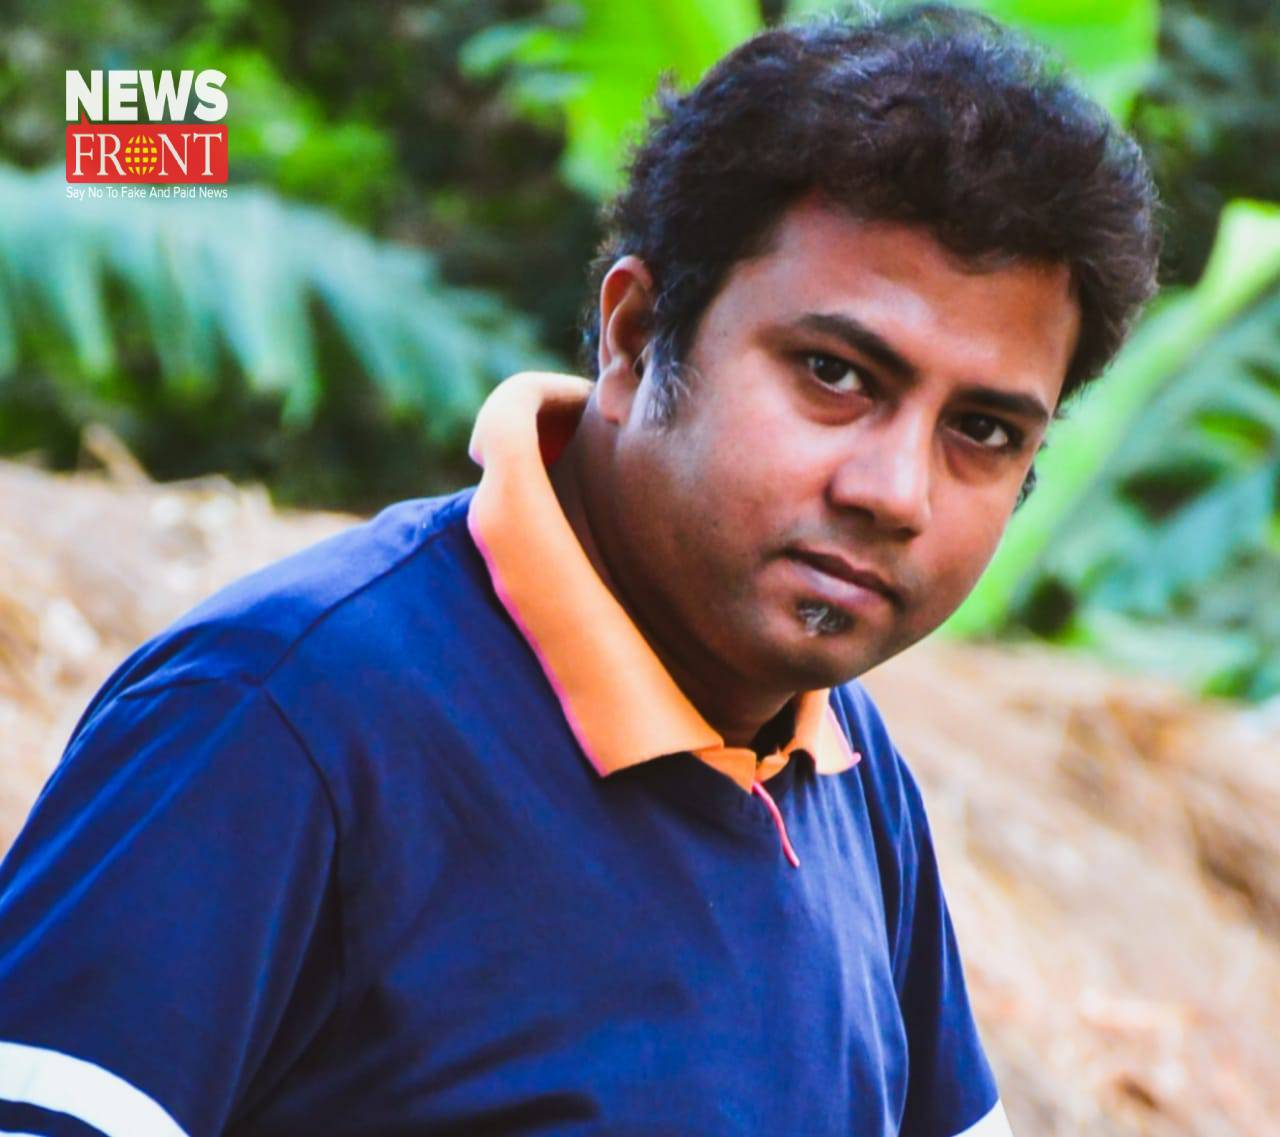 Subrata sharma | newsfront.co